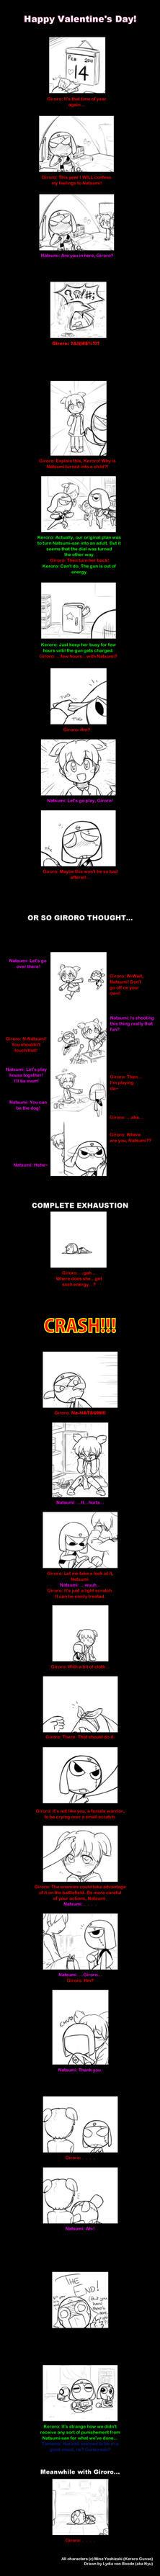 GiroNatsu Valentine's Comic by nyu